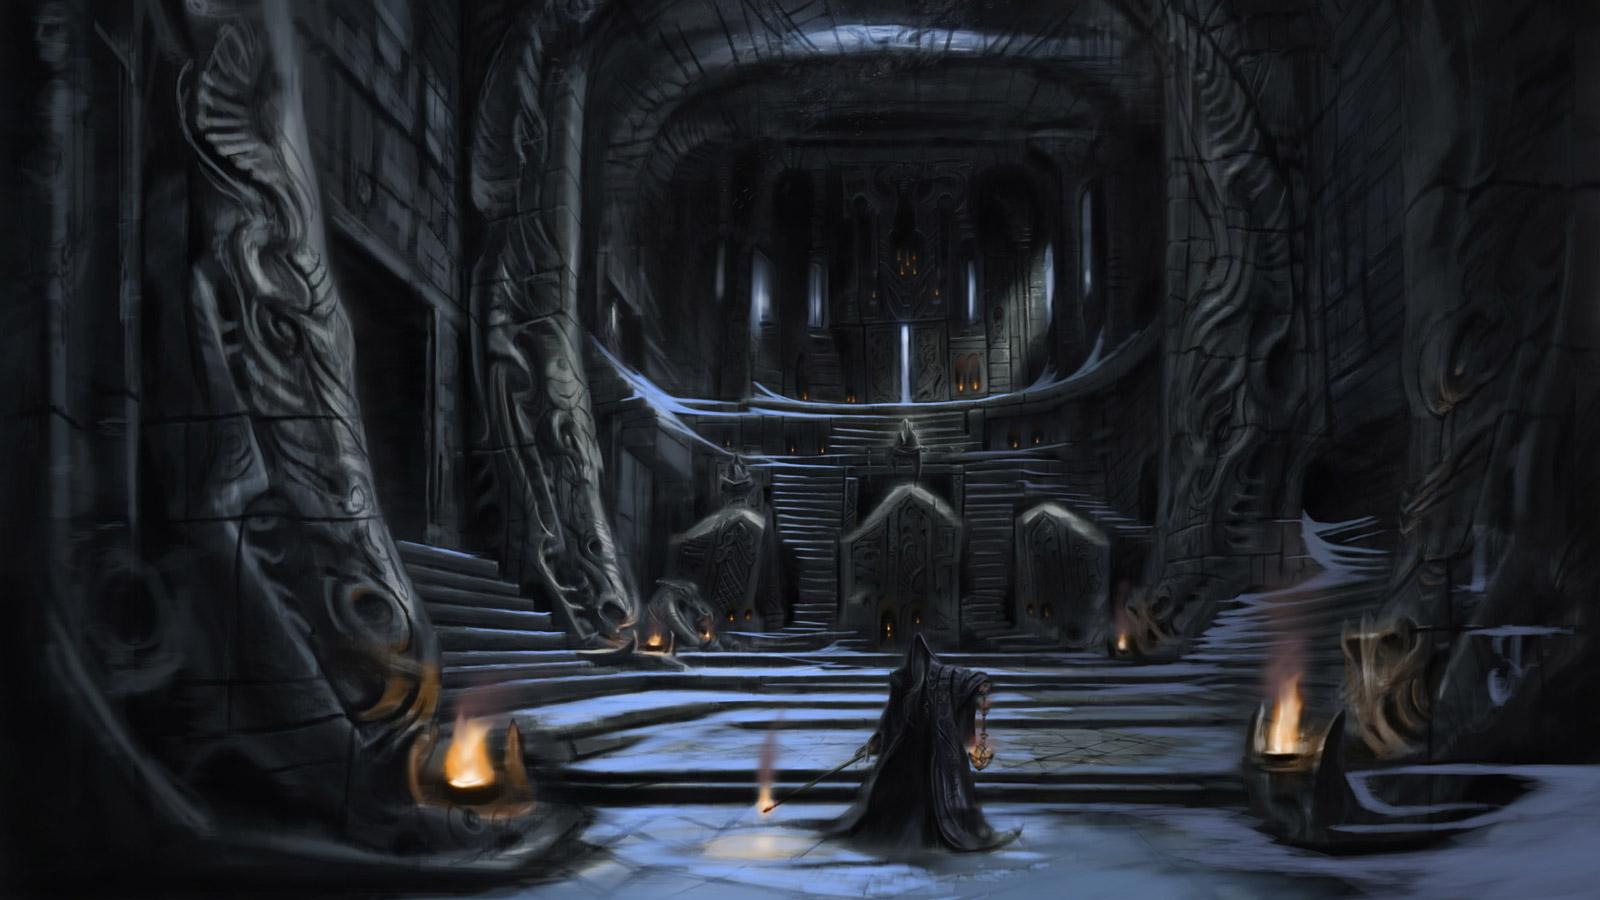 Free The Elder Scrolls V: Skyrim Wallpaper in 1600x900